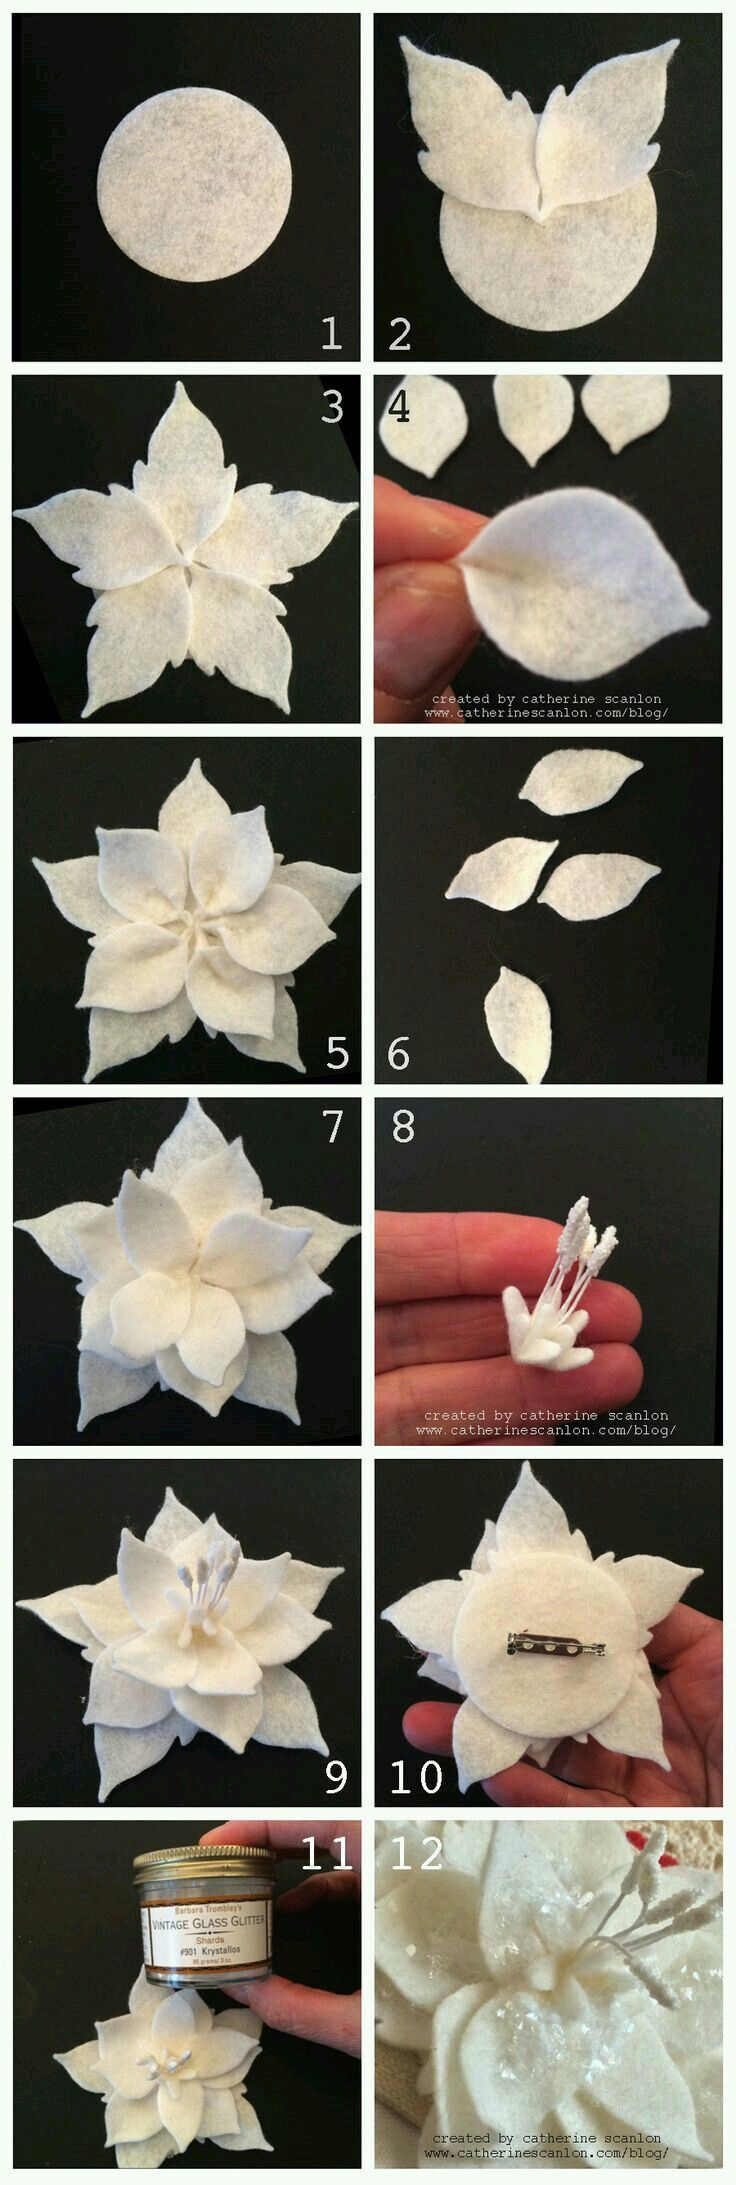 Risultati immagini per flores navideñas blancas de fondant